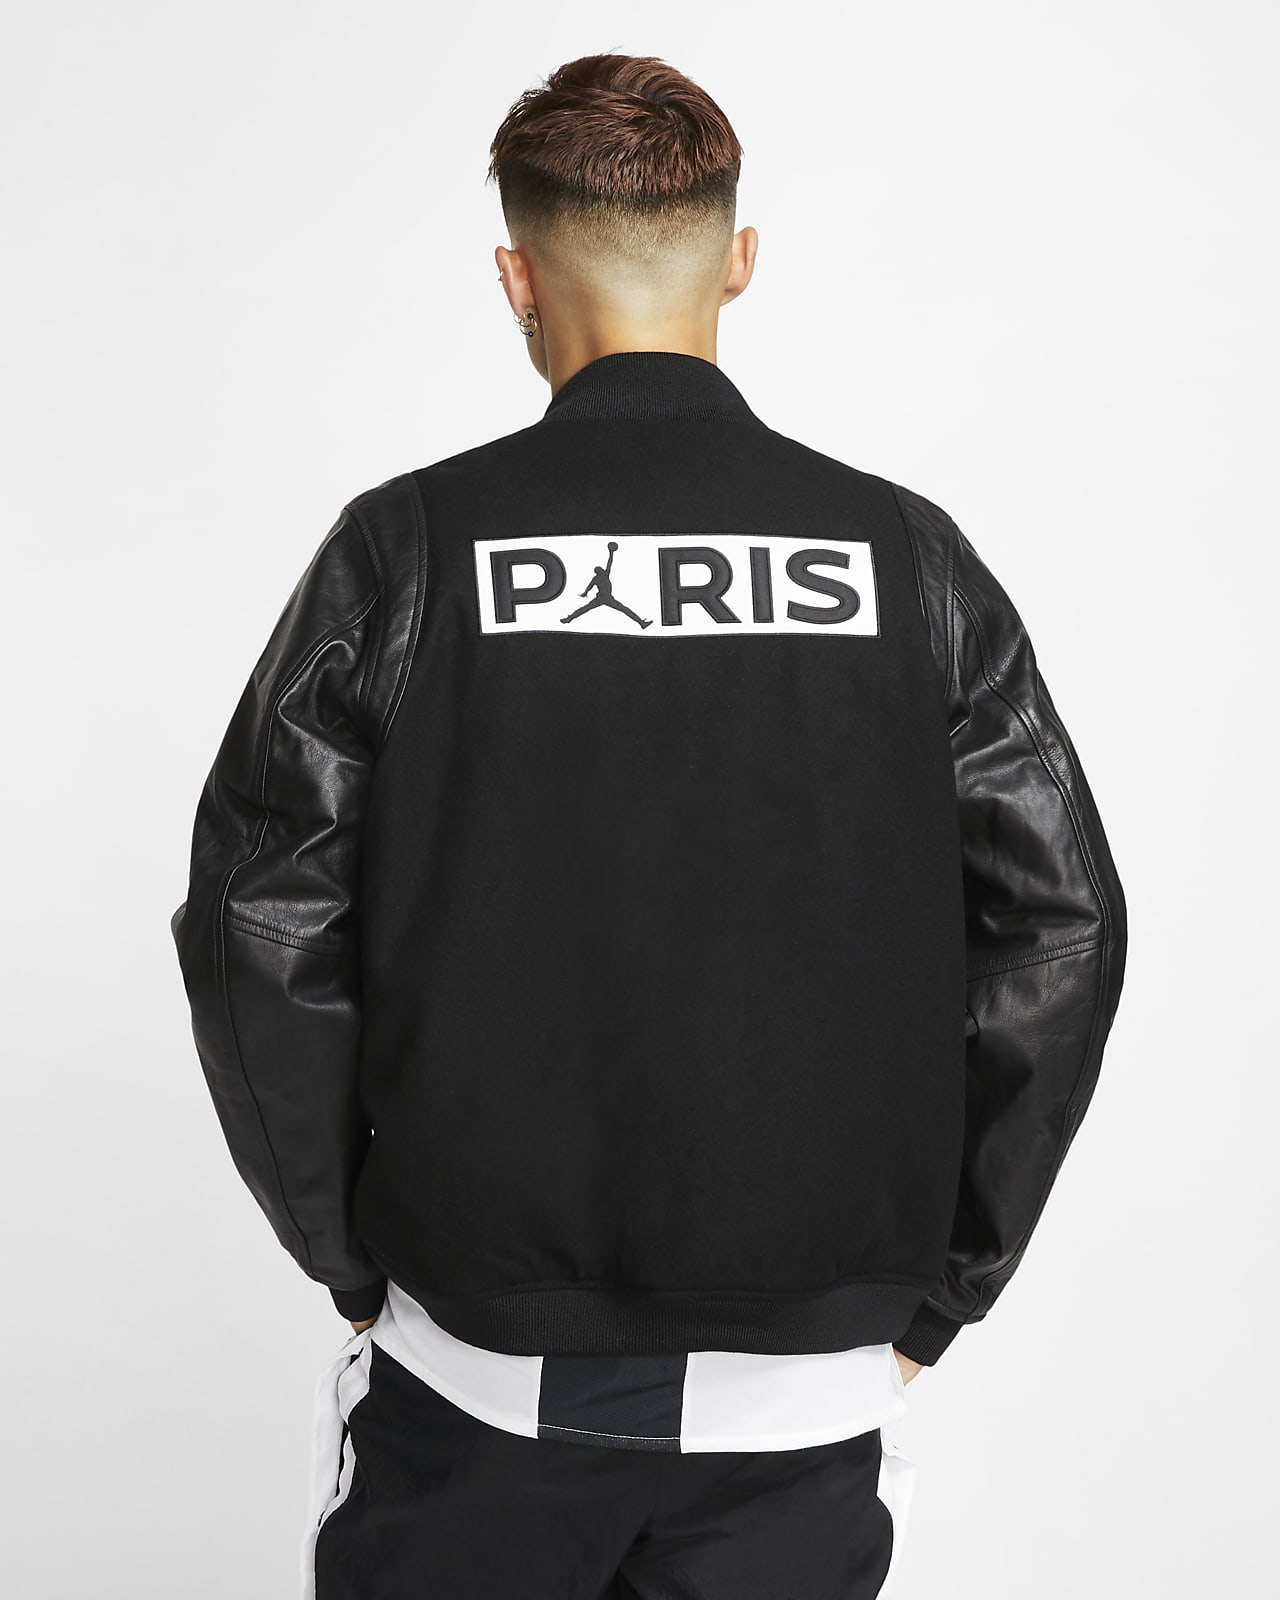 PSG Men's Varsity Jacket. Nike ID